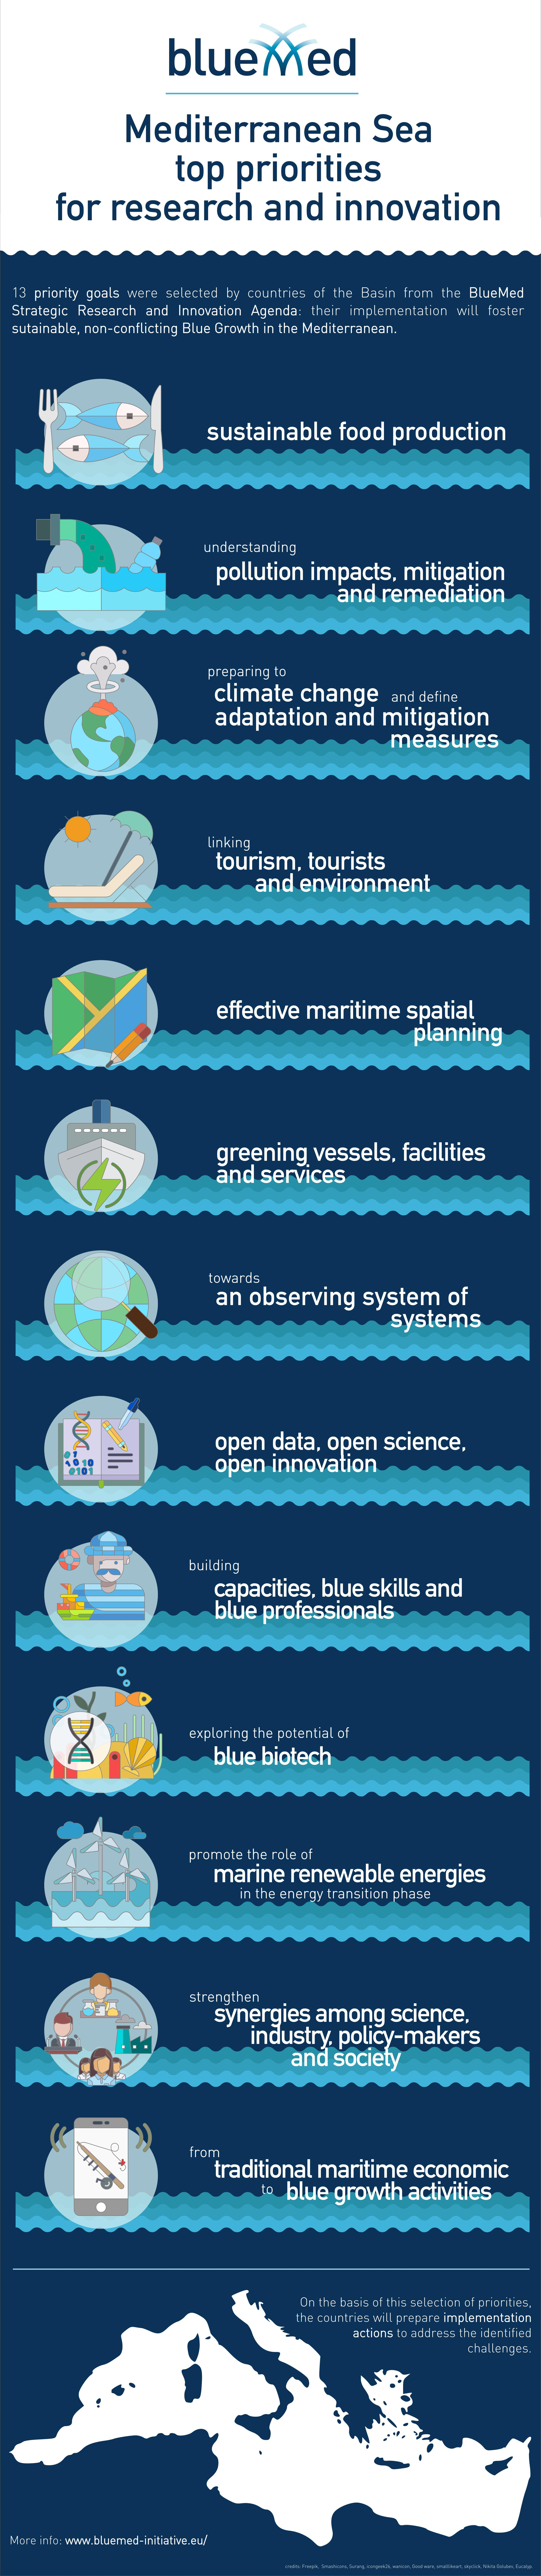 BM - infografica priorità - ver